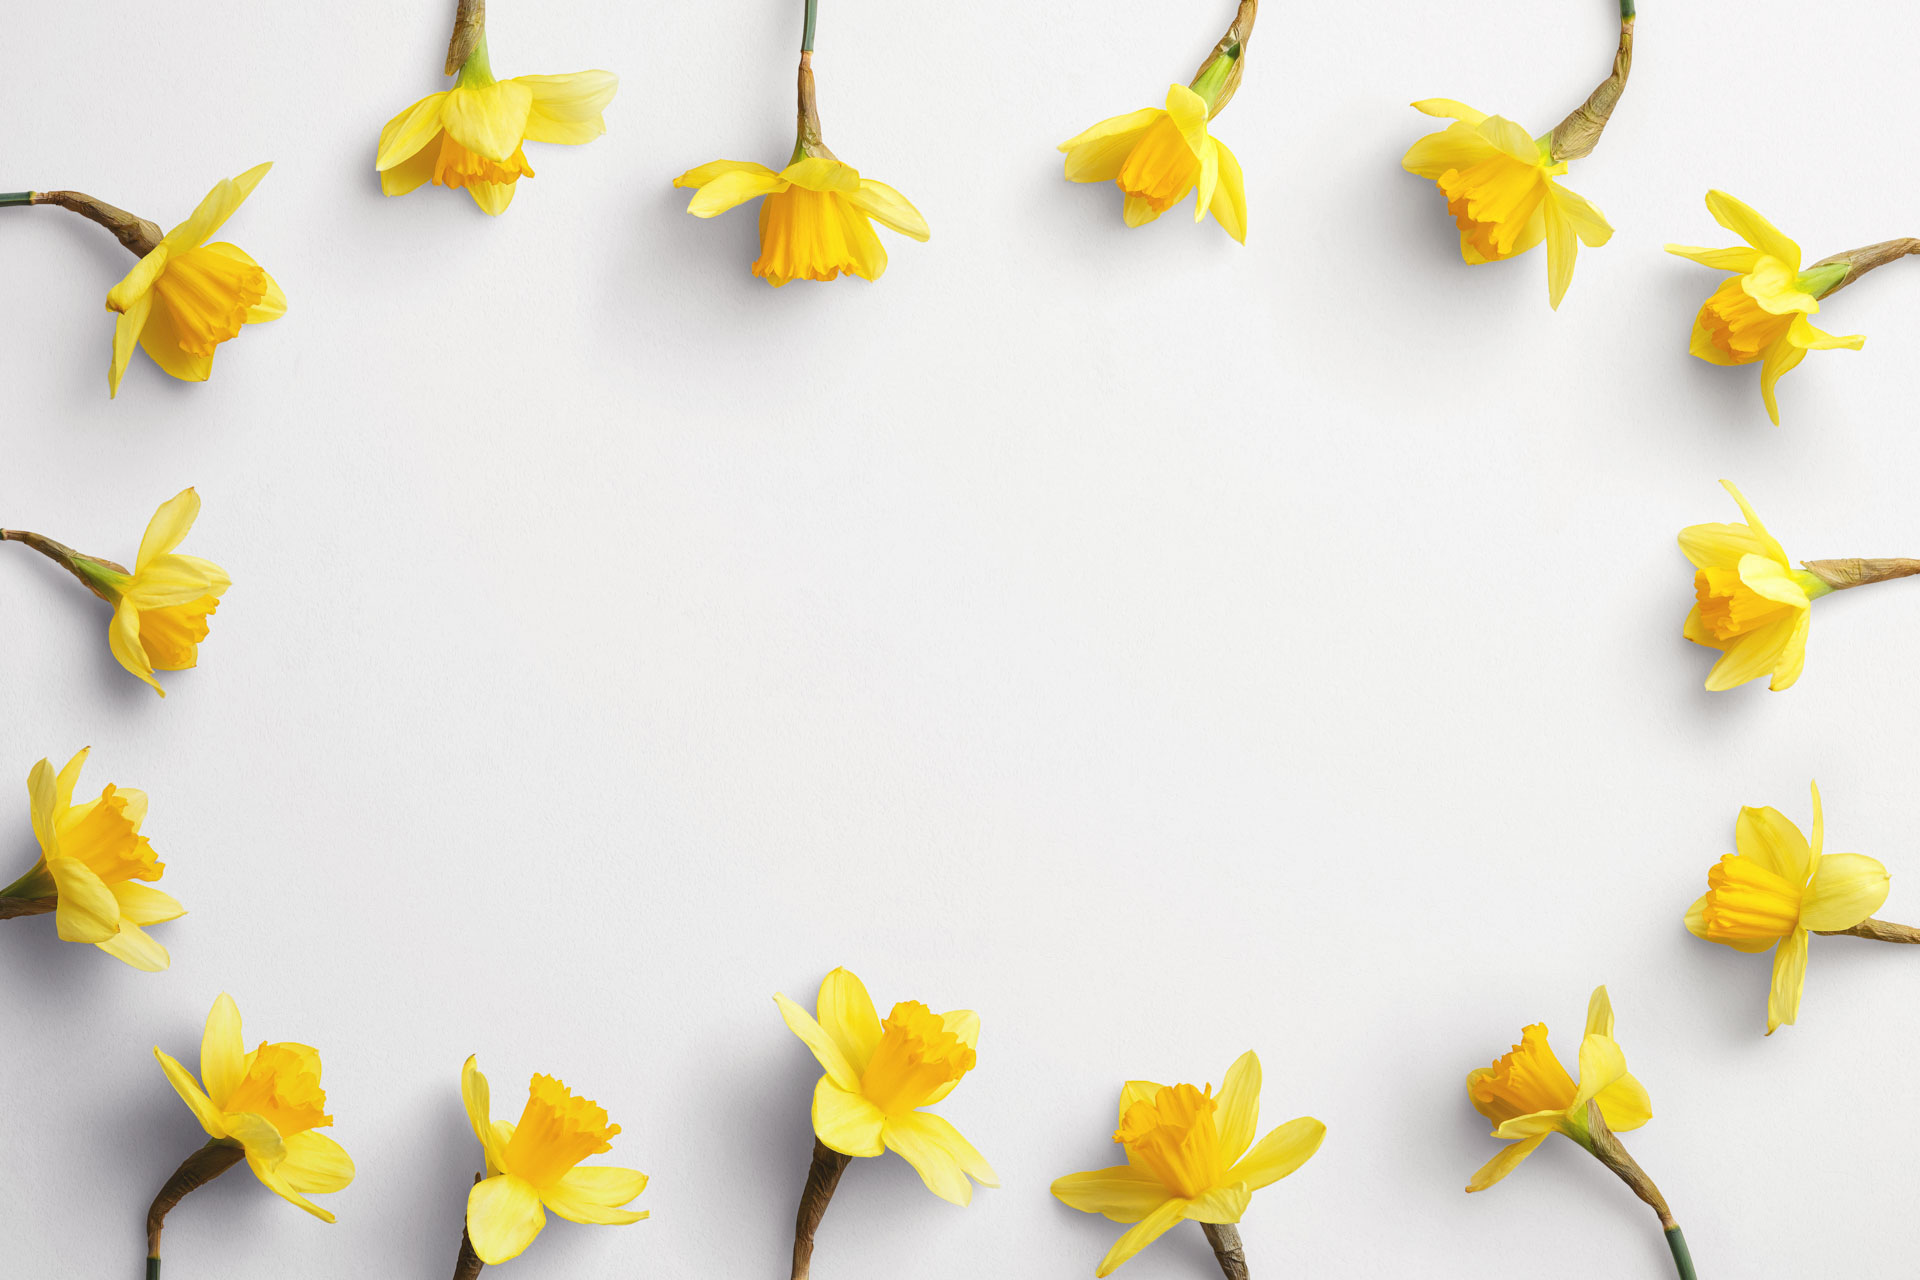 daffodils custom scene creator template 8 Thumbnail